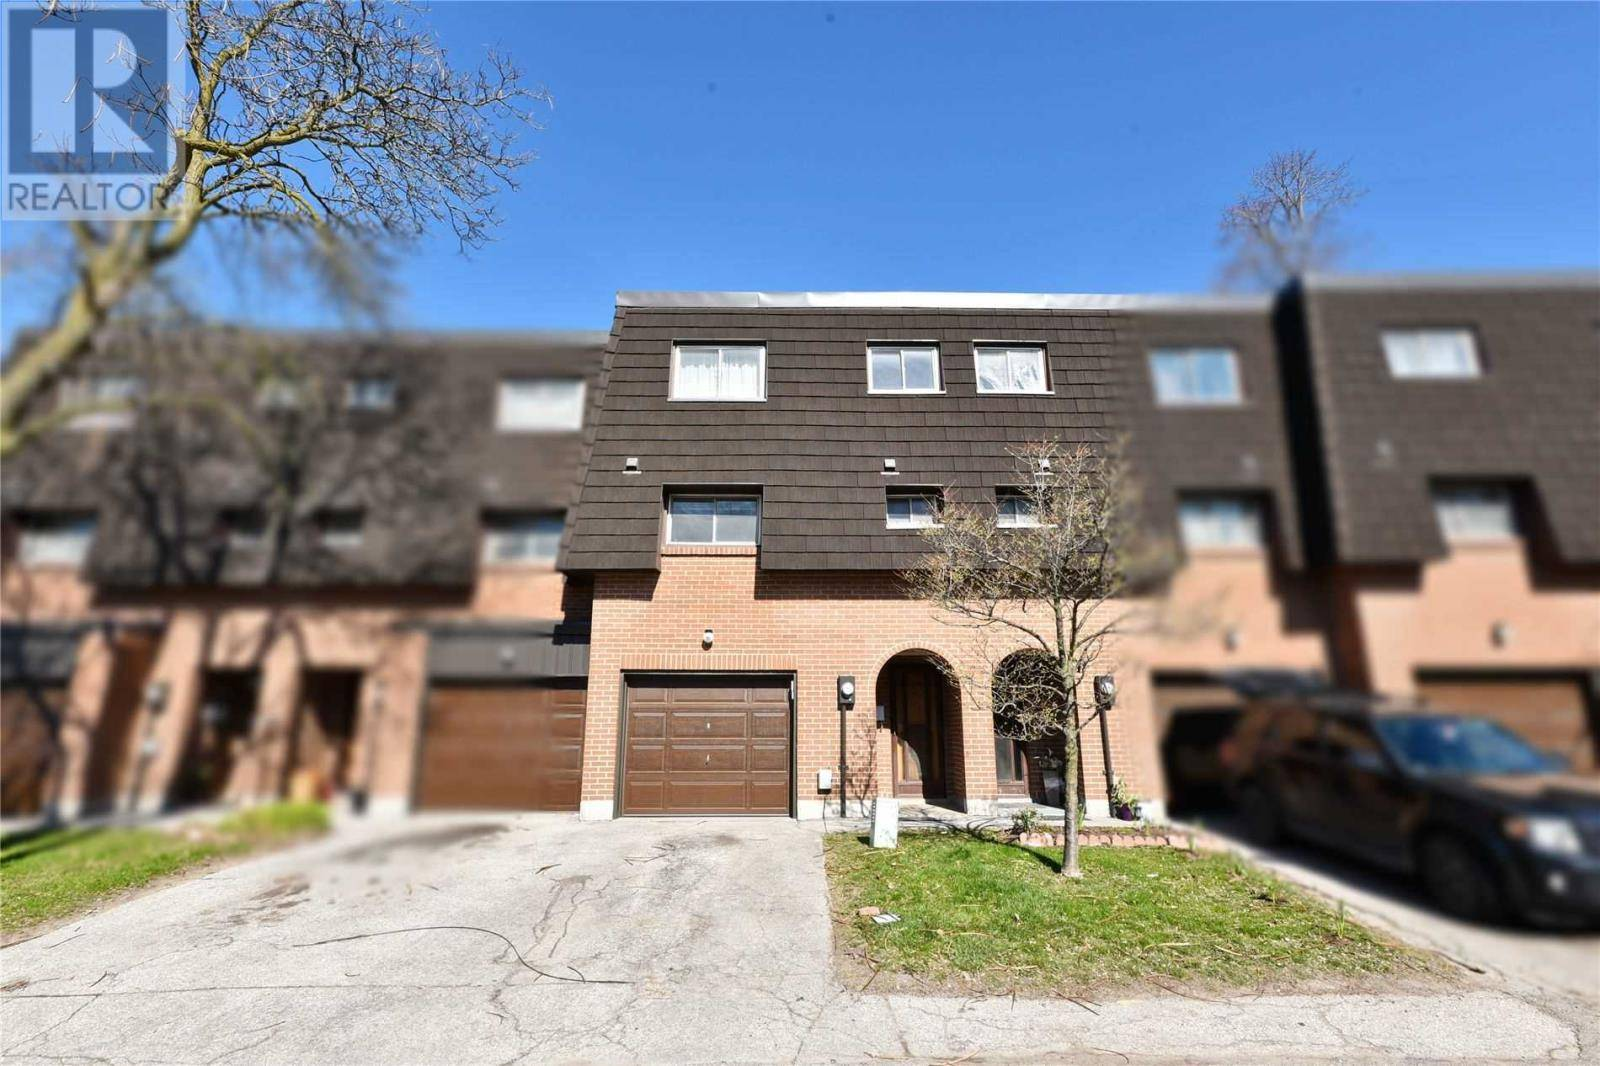 Townhouse for sale at 16 Darras Ct Brampton Ontario - MLS: W4749261